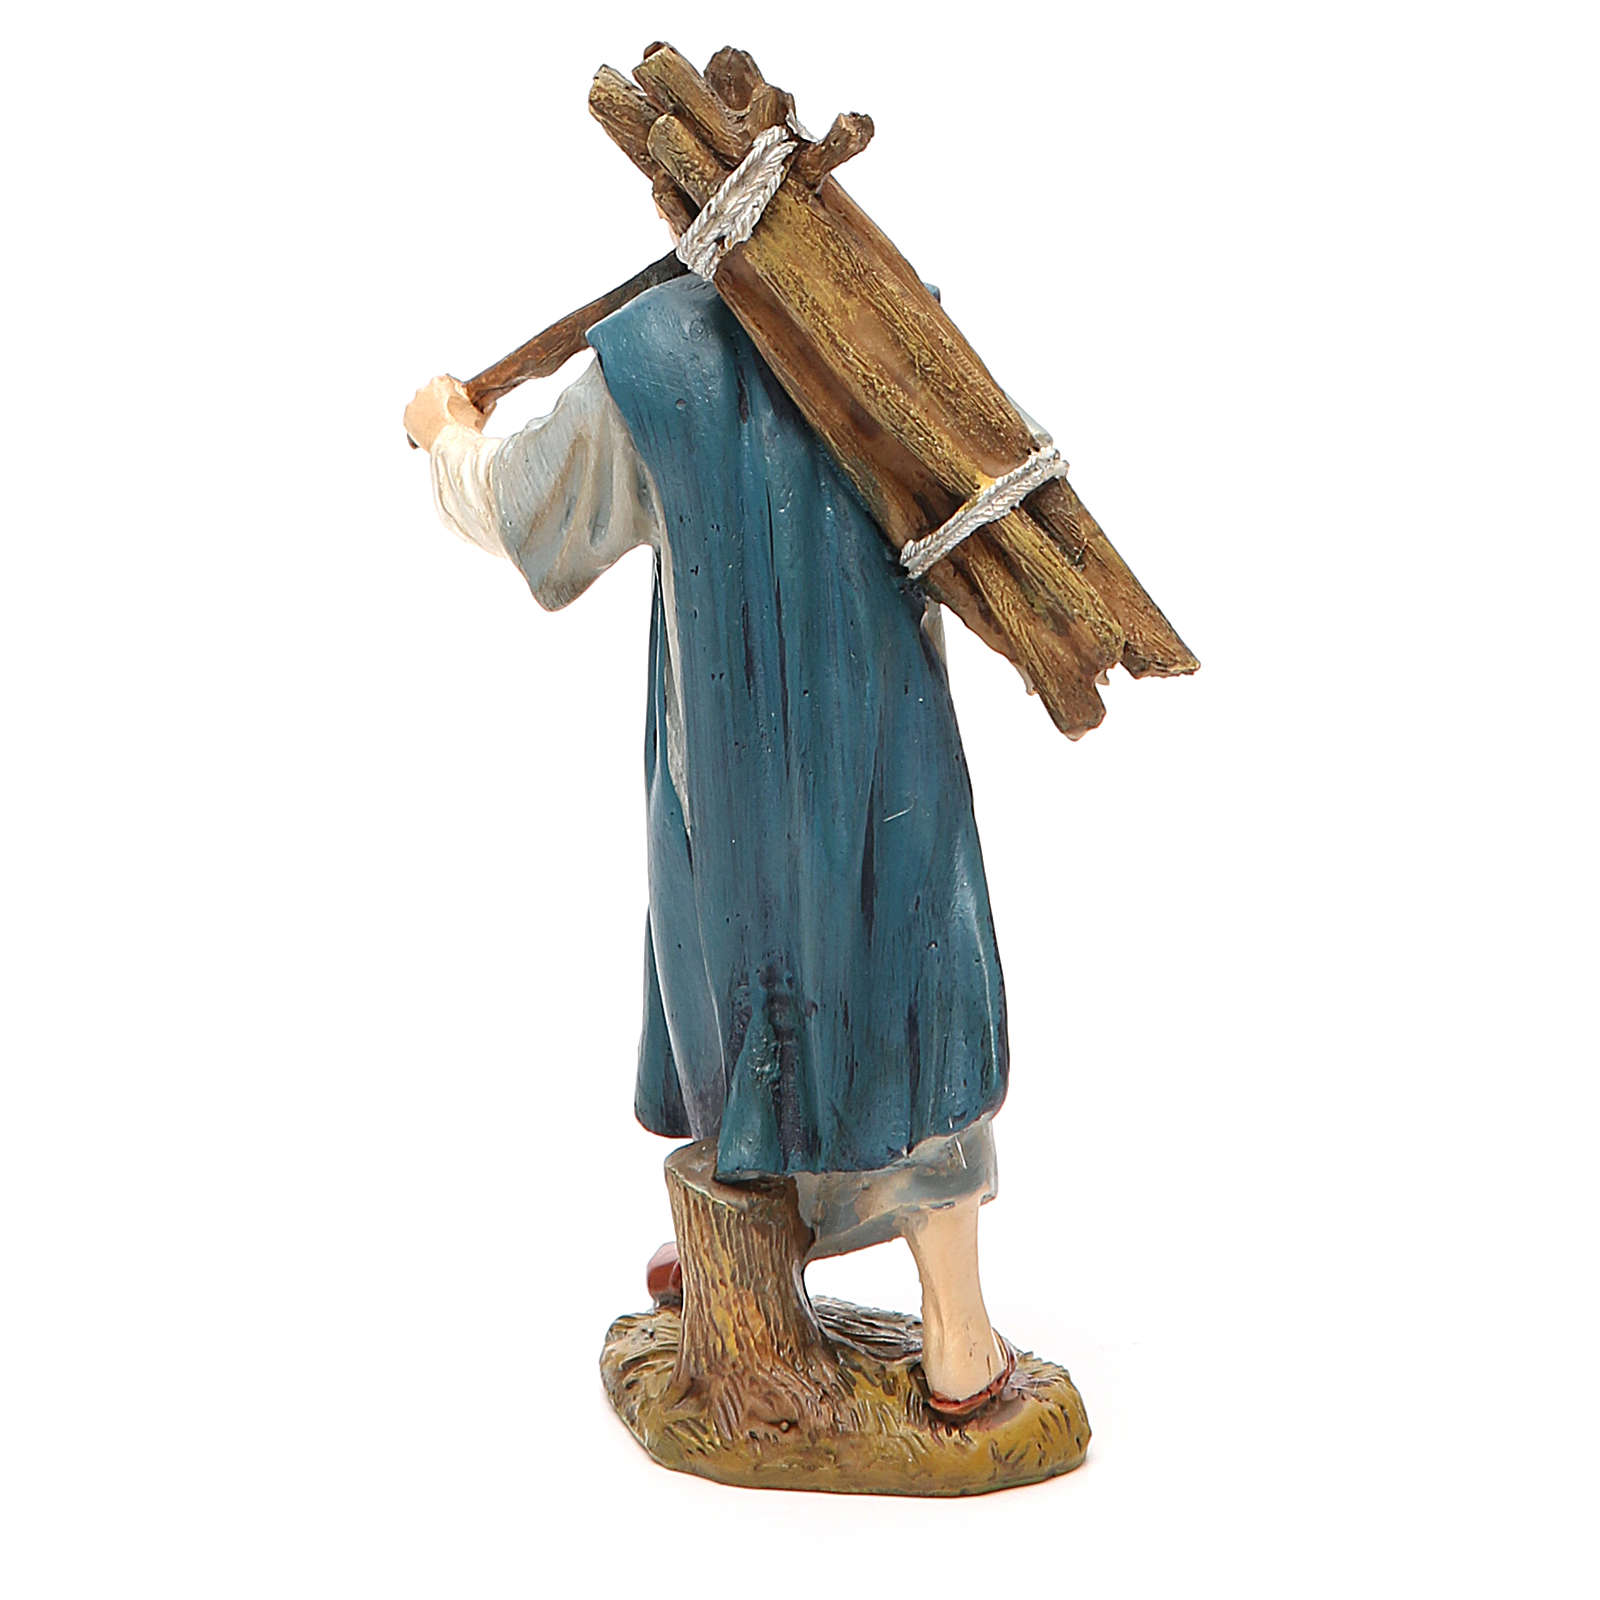 Pastore con legna resina dipinta cm 12 Linea economica Landi 3